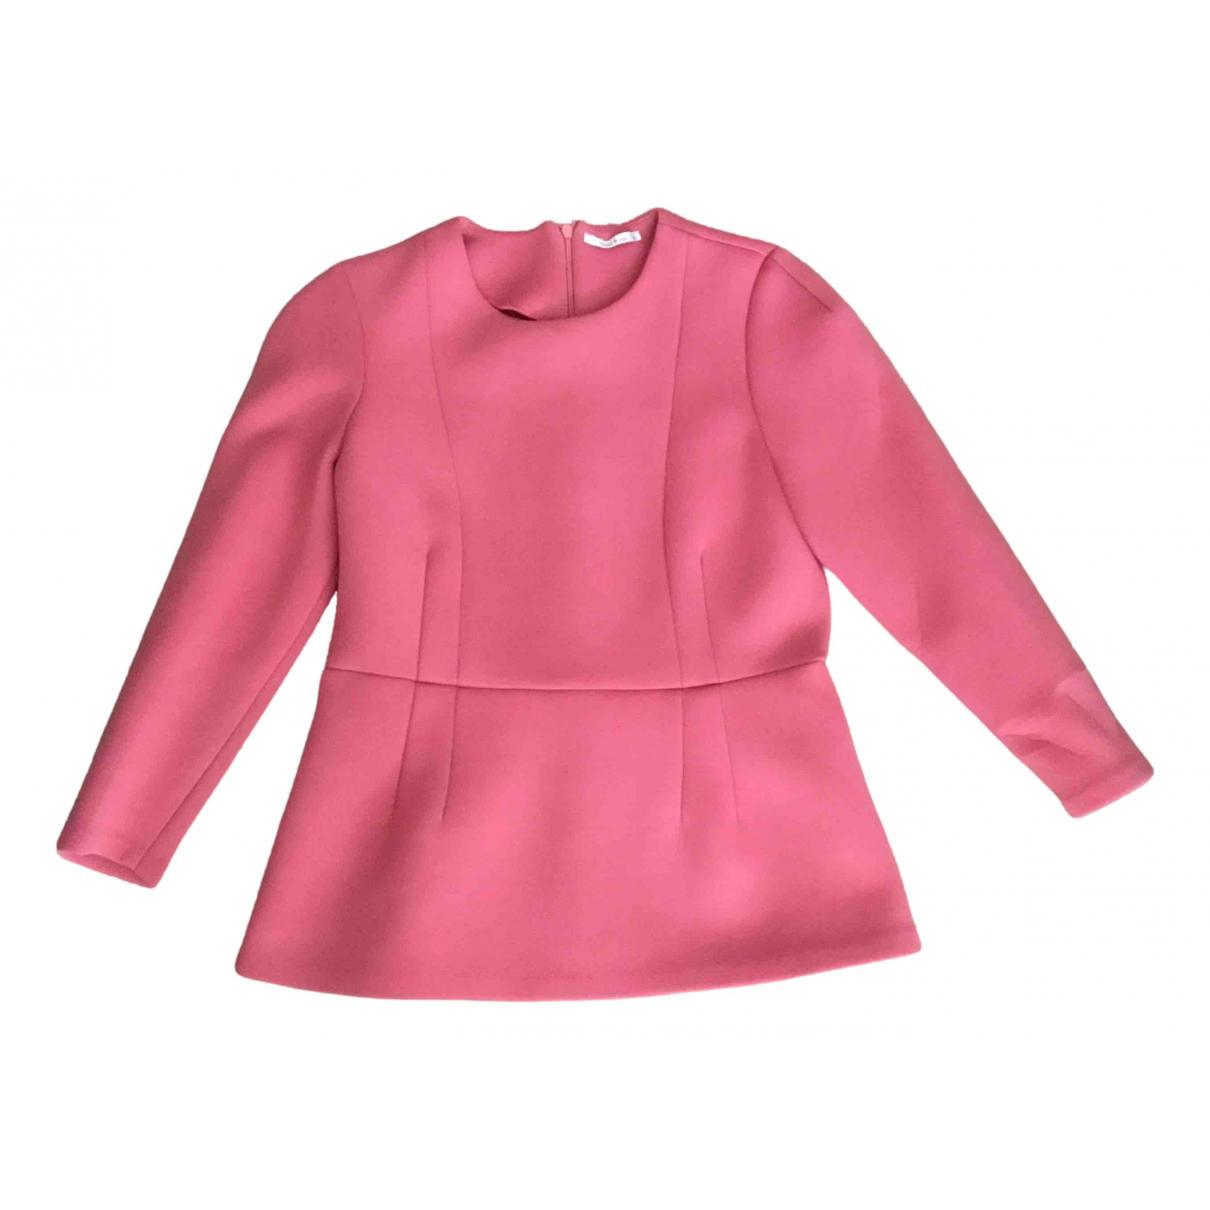 Bimba Y Lola \N Pink Cotton  top for Women S International